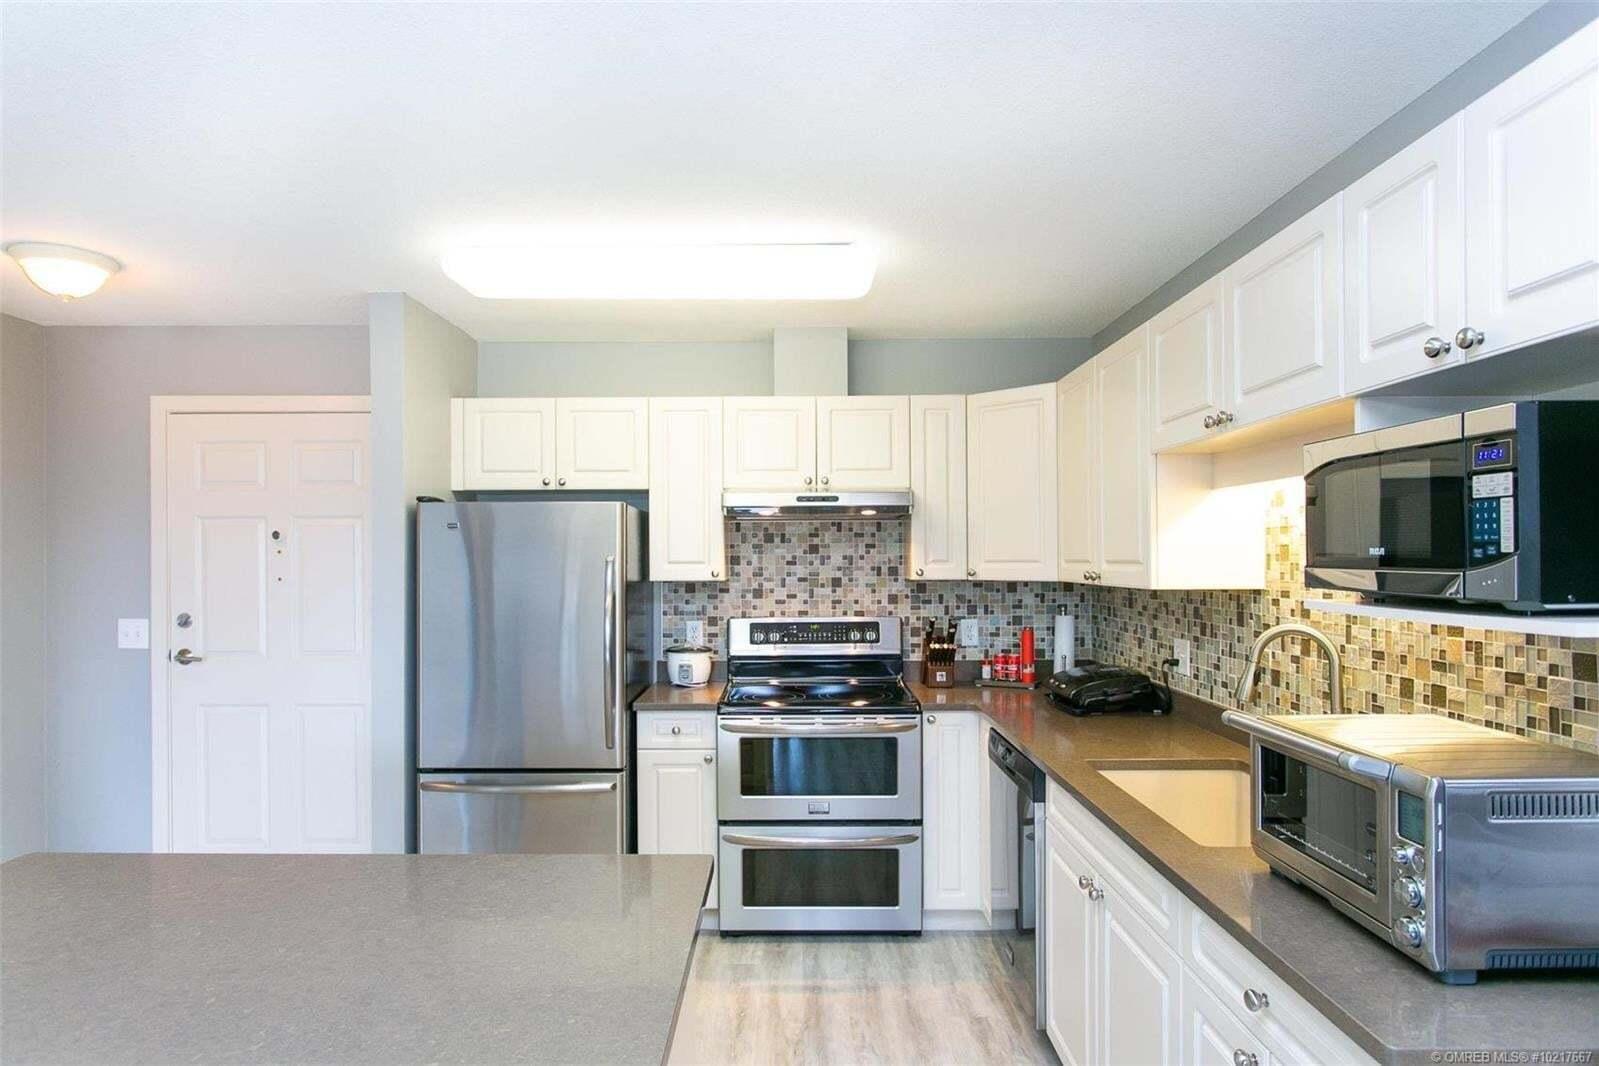 Condo for sale at 250 Dougall Rd North Unit 408 Kelowna British Columbia - MLS: 10217667